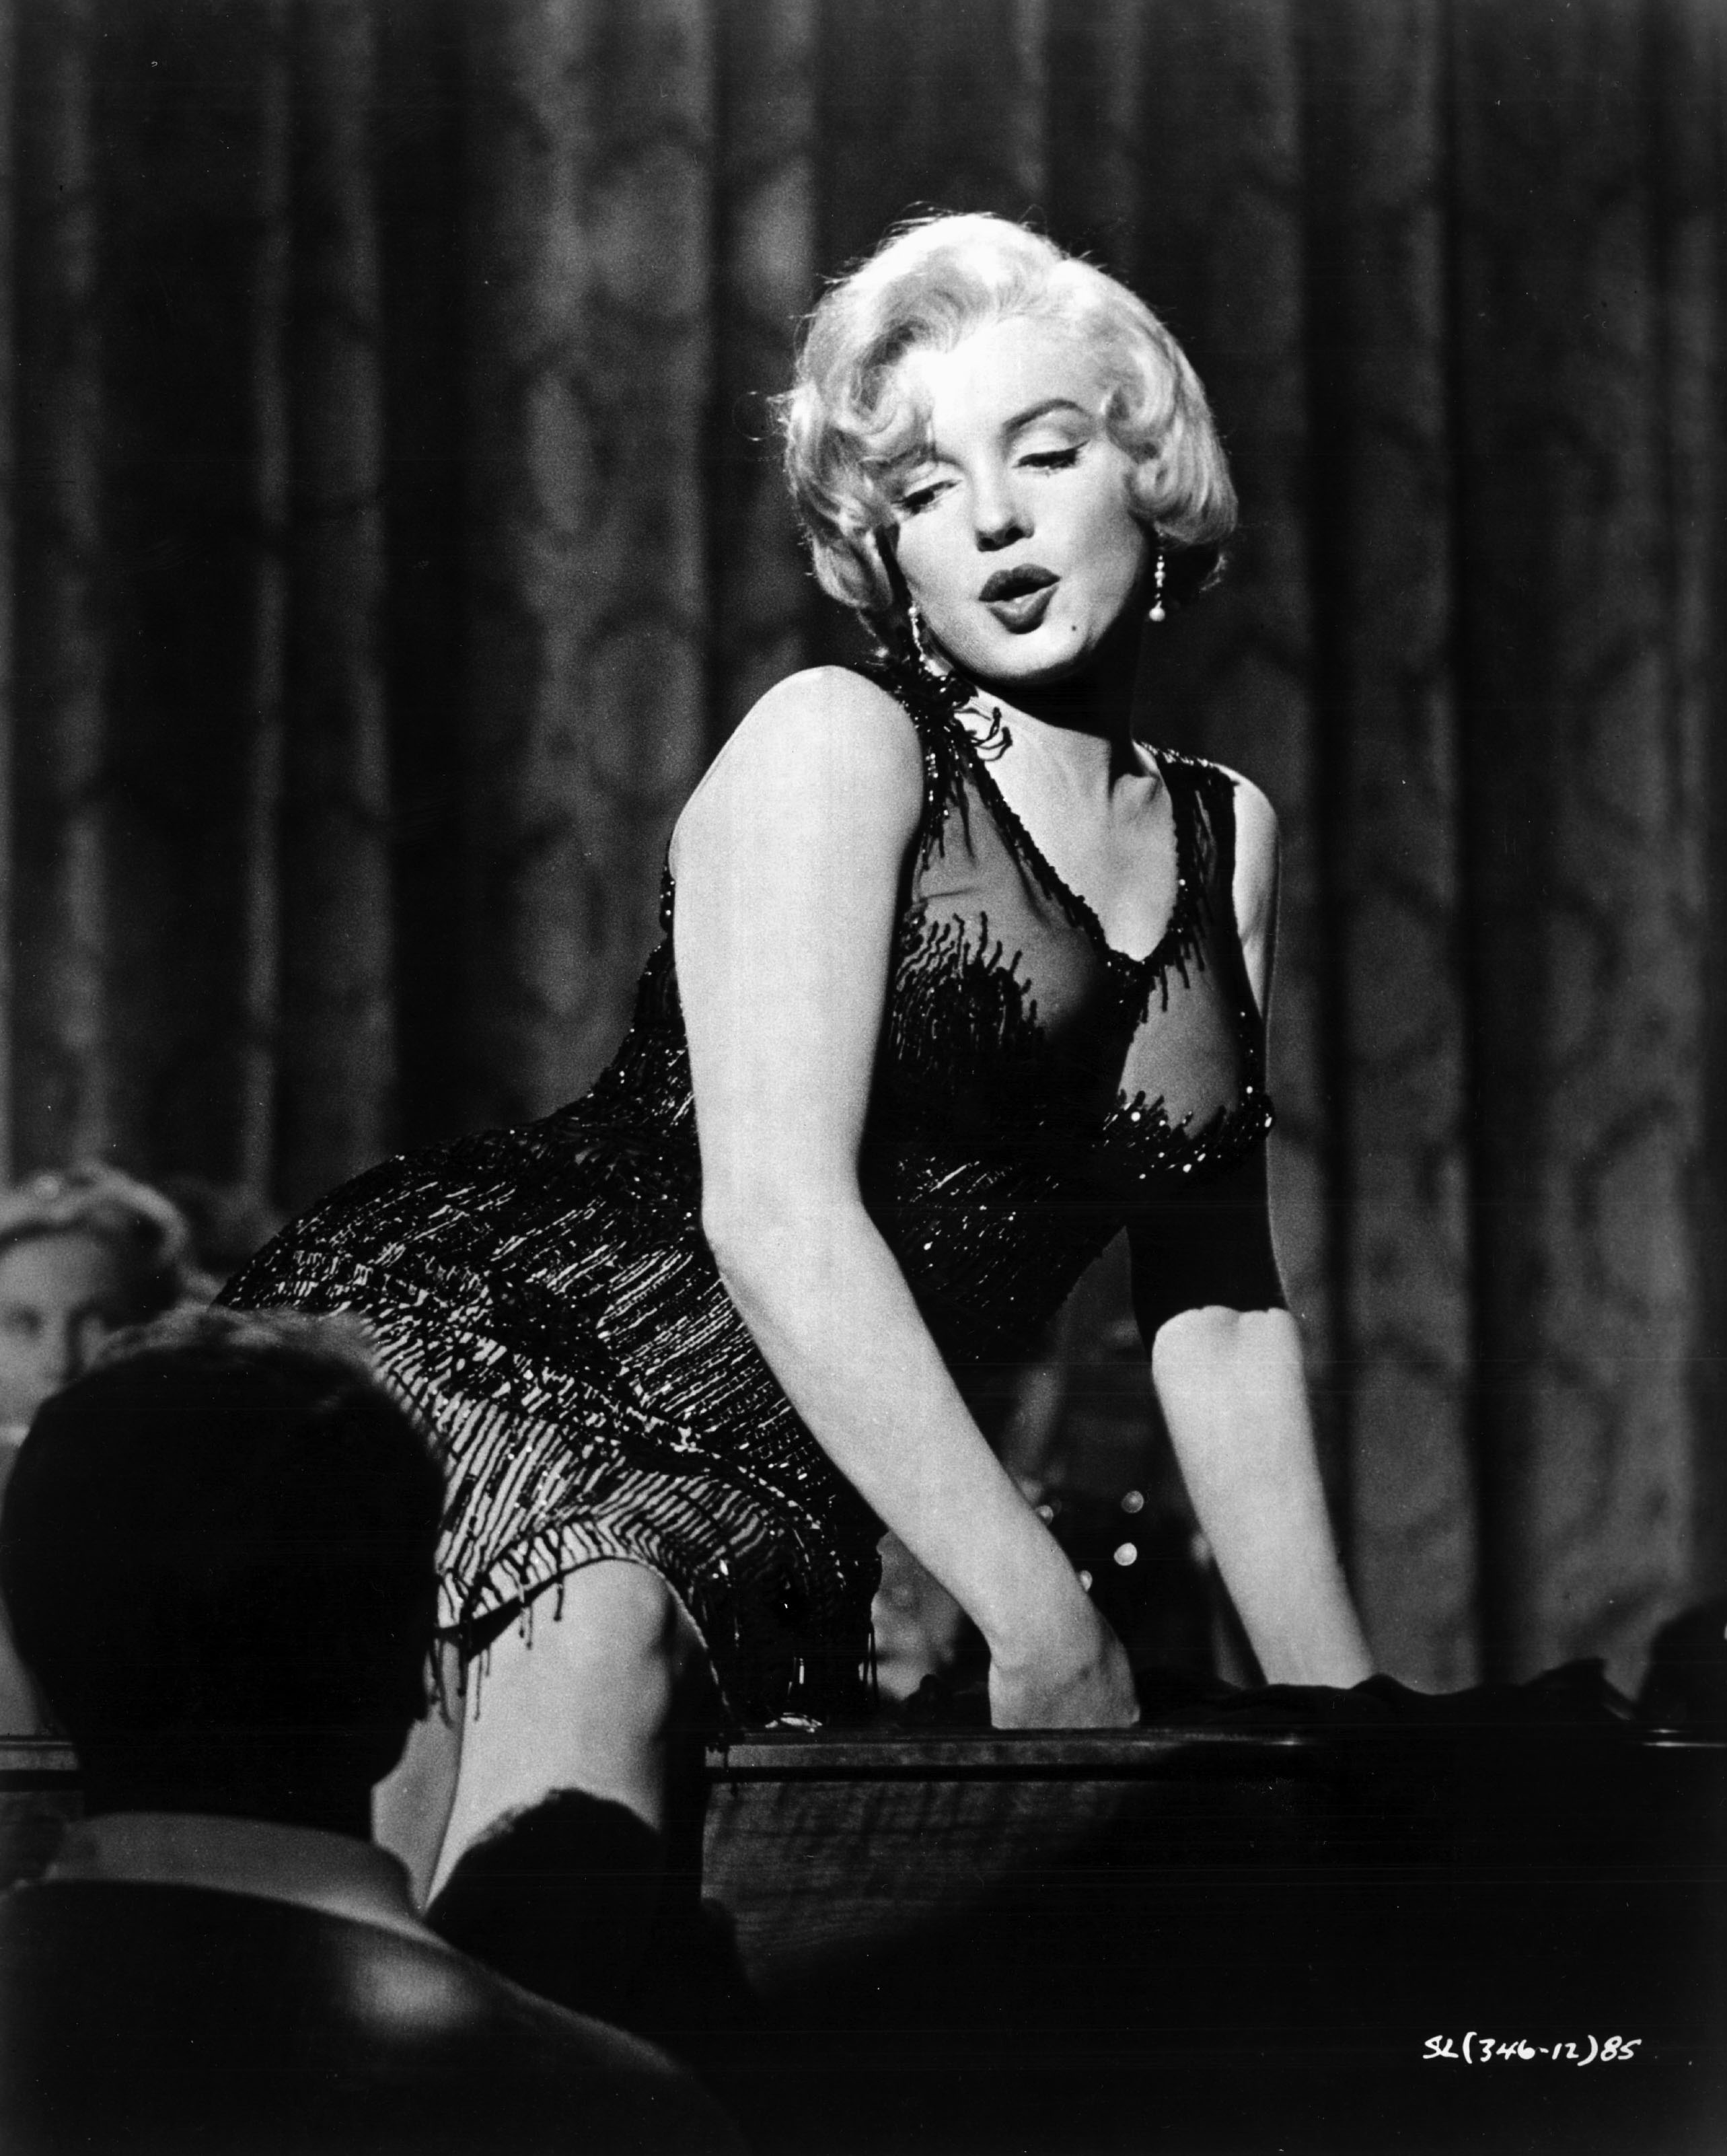 Citaten Marilyn Monroe Movie : Images about marilyn monroe birthday weekend past